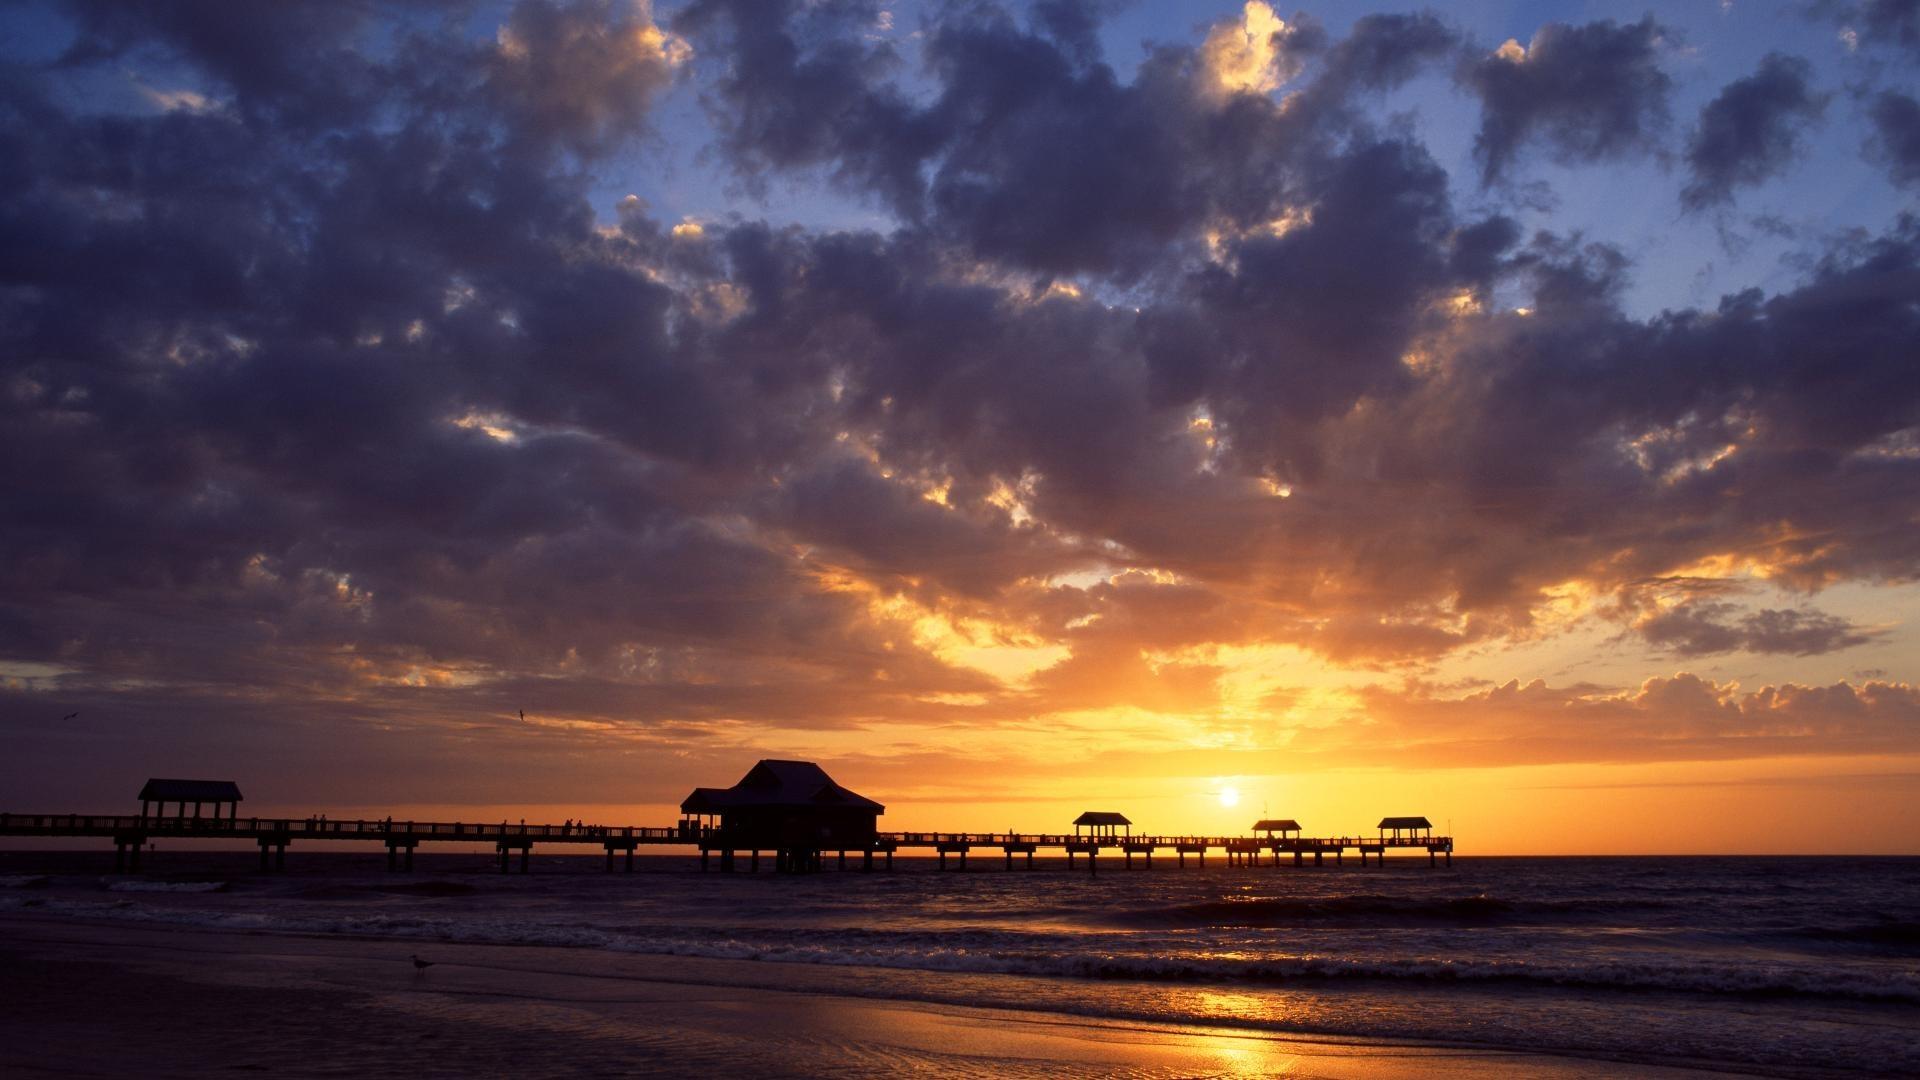 Wallpaper Clearwater Fl: Pensacola Beach Wallpaper